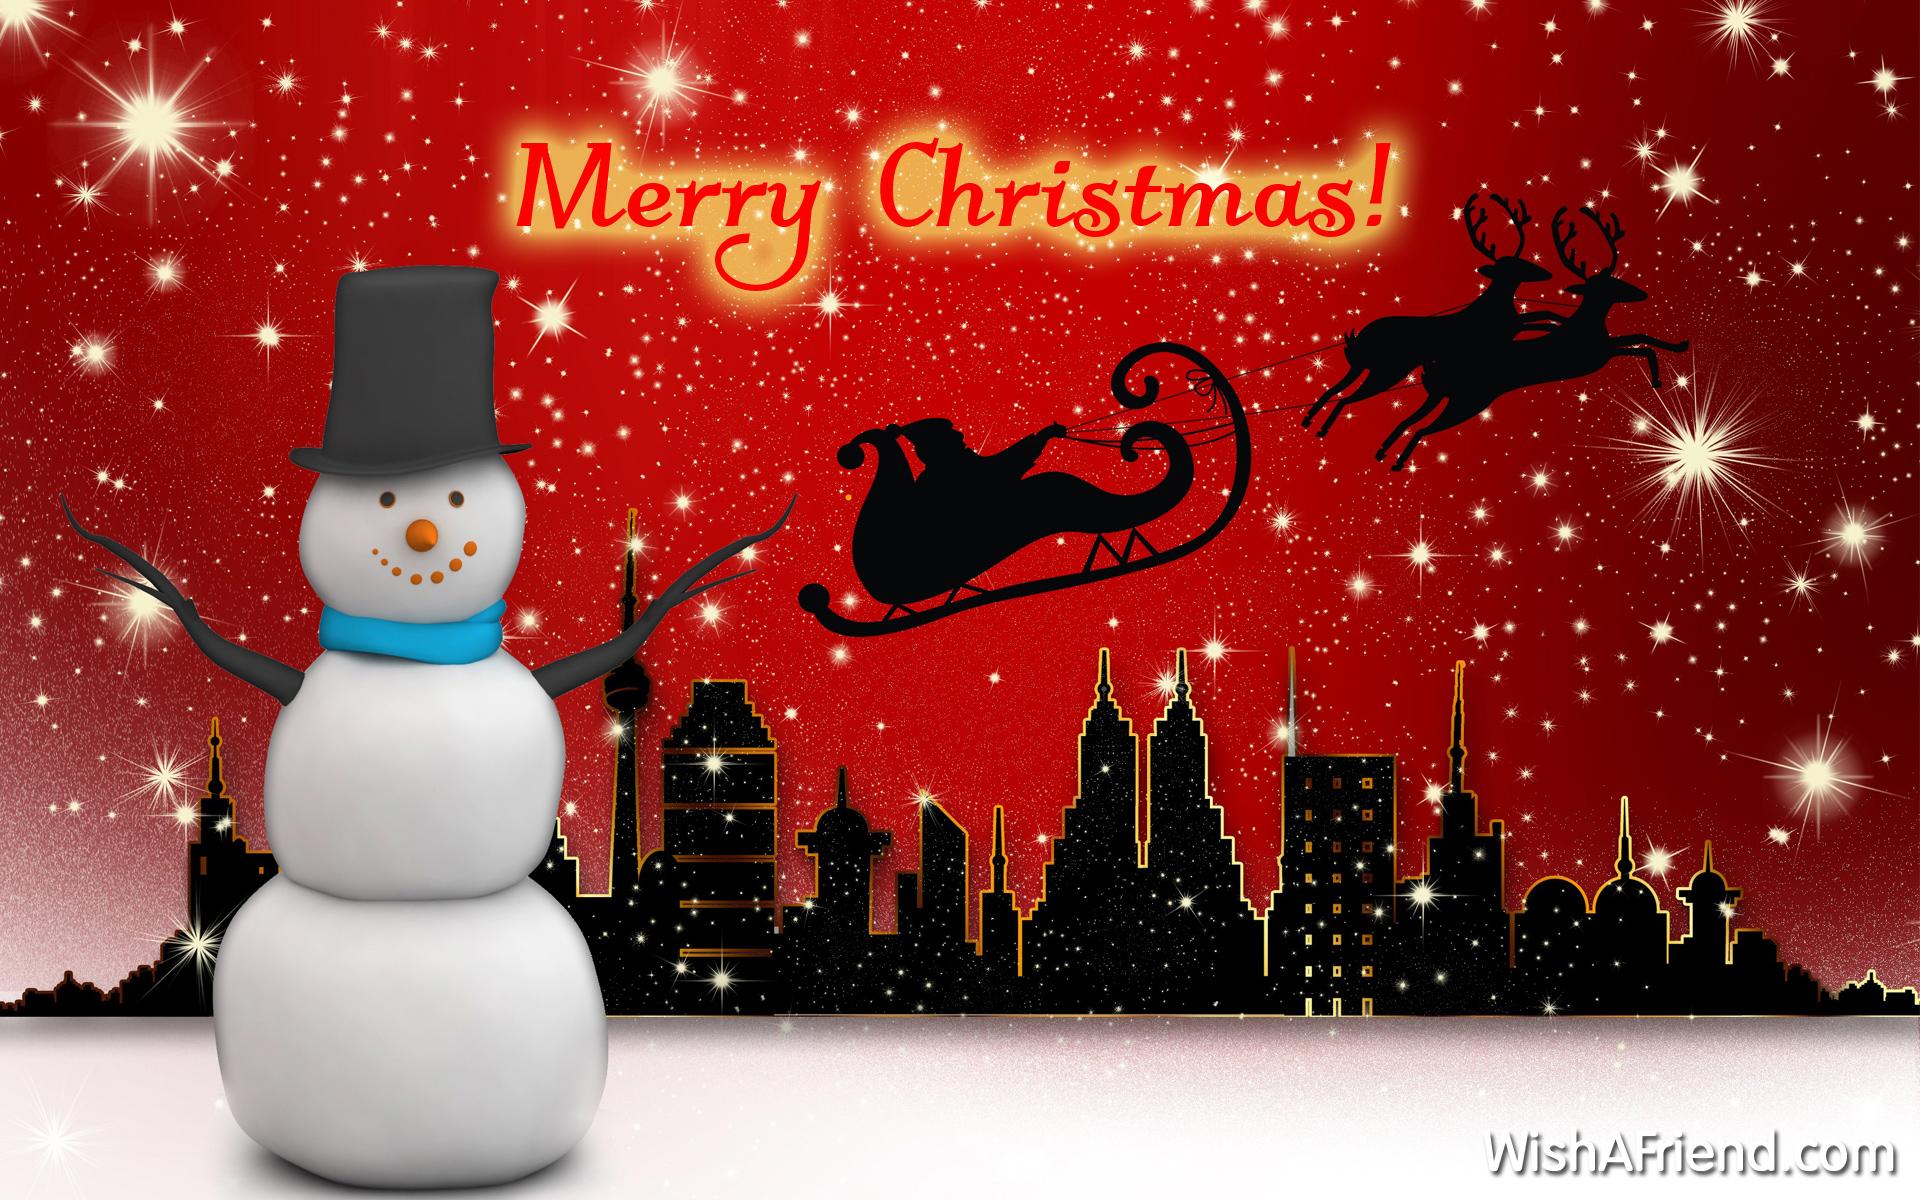 Christmas Snowman Wallpapers